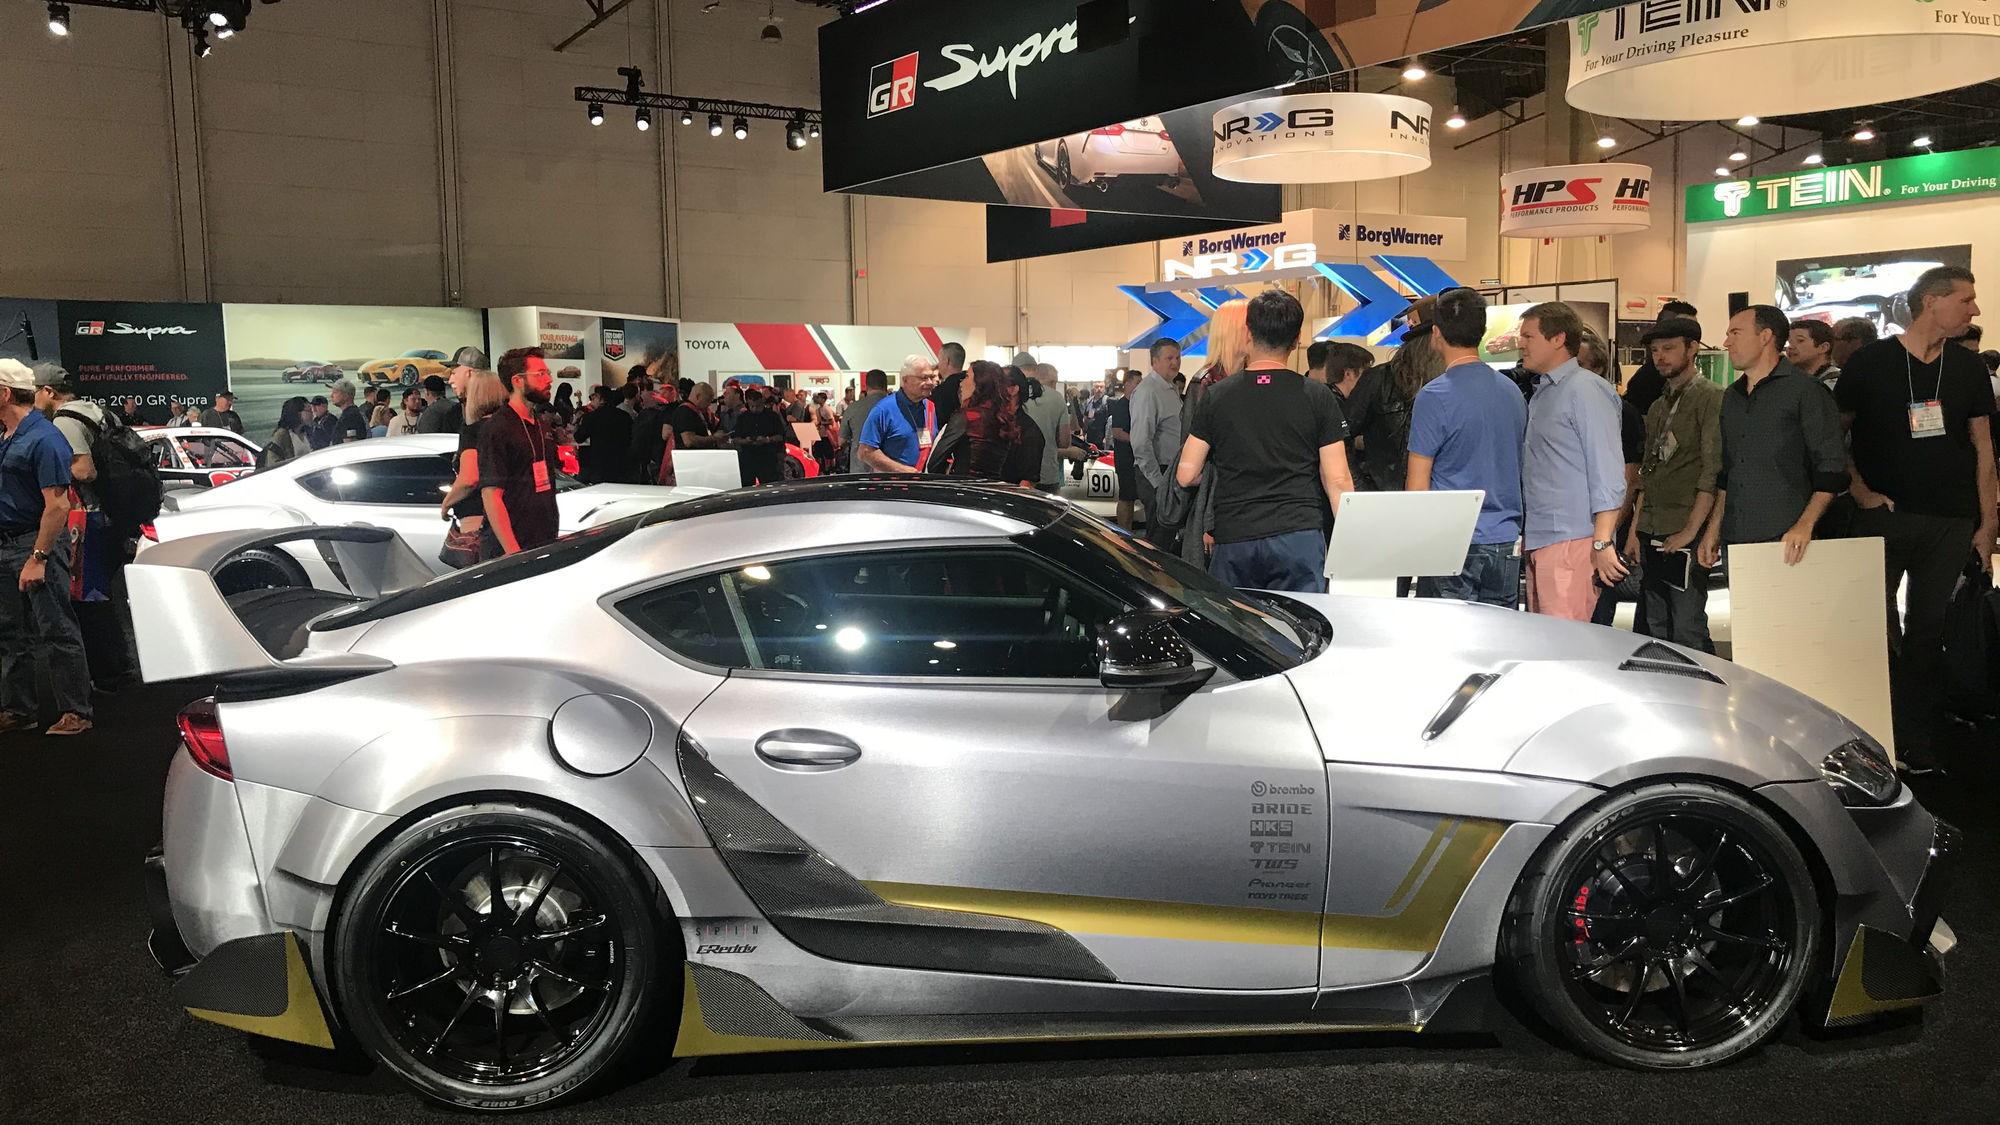 GR Supra 3000GT Concept - SEMA 2019